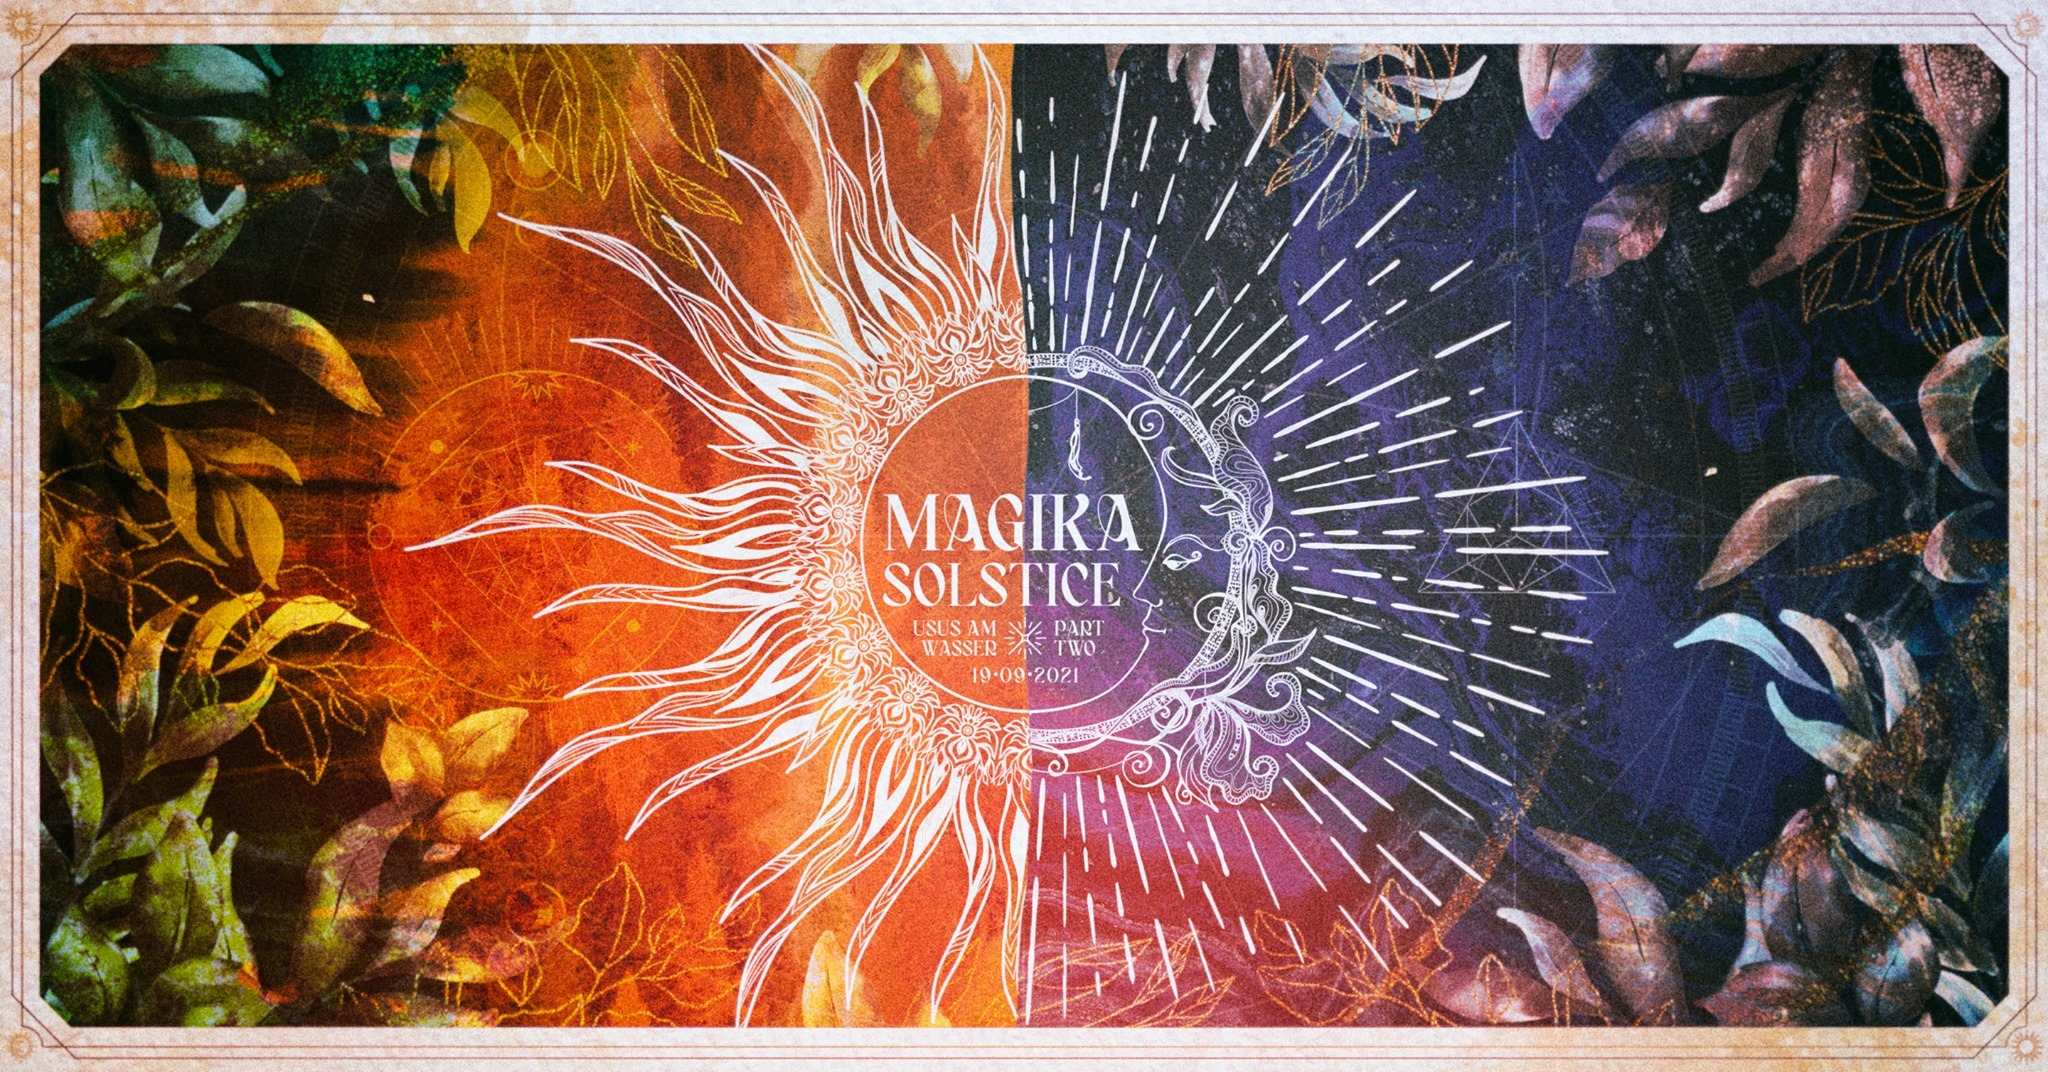 Events Wien: Magika Solstice – part 1 w/Mirmur